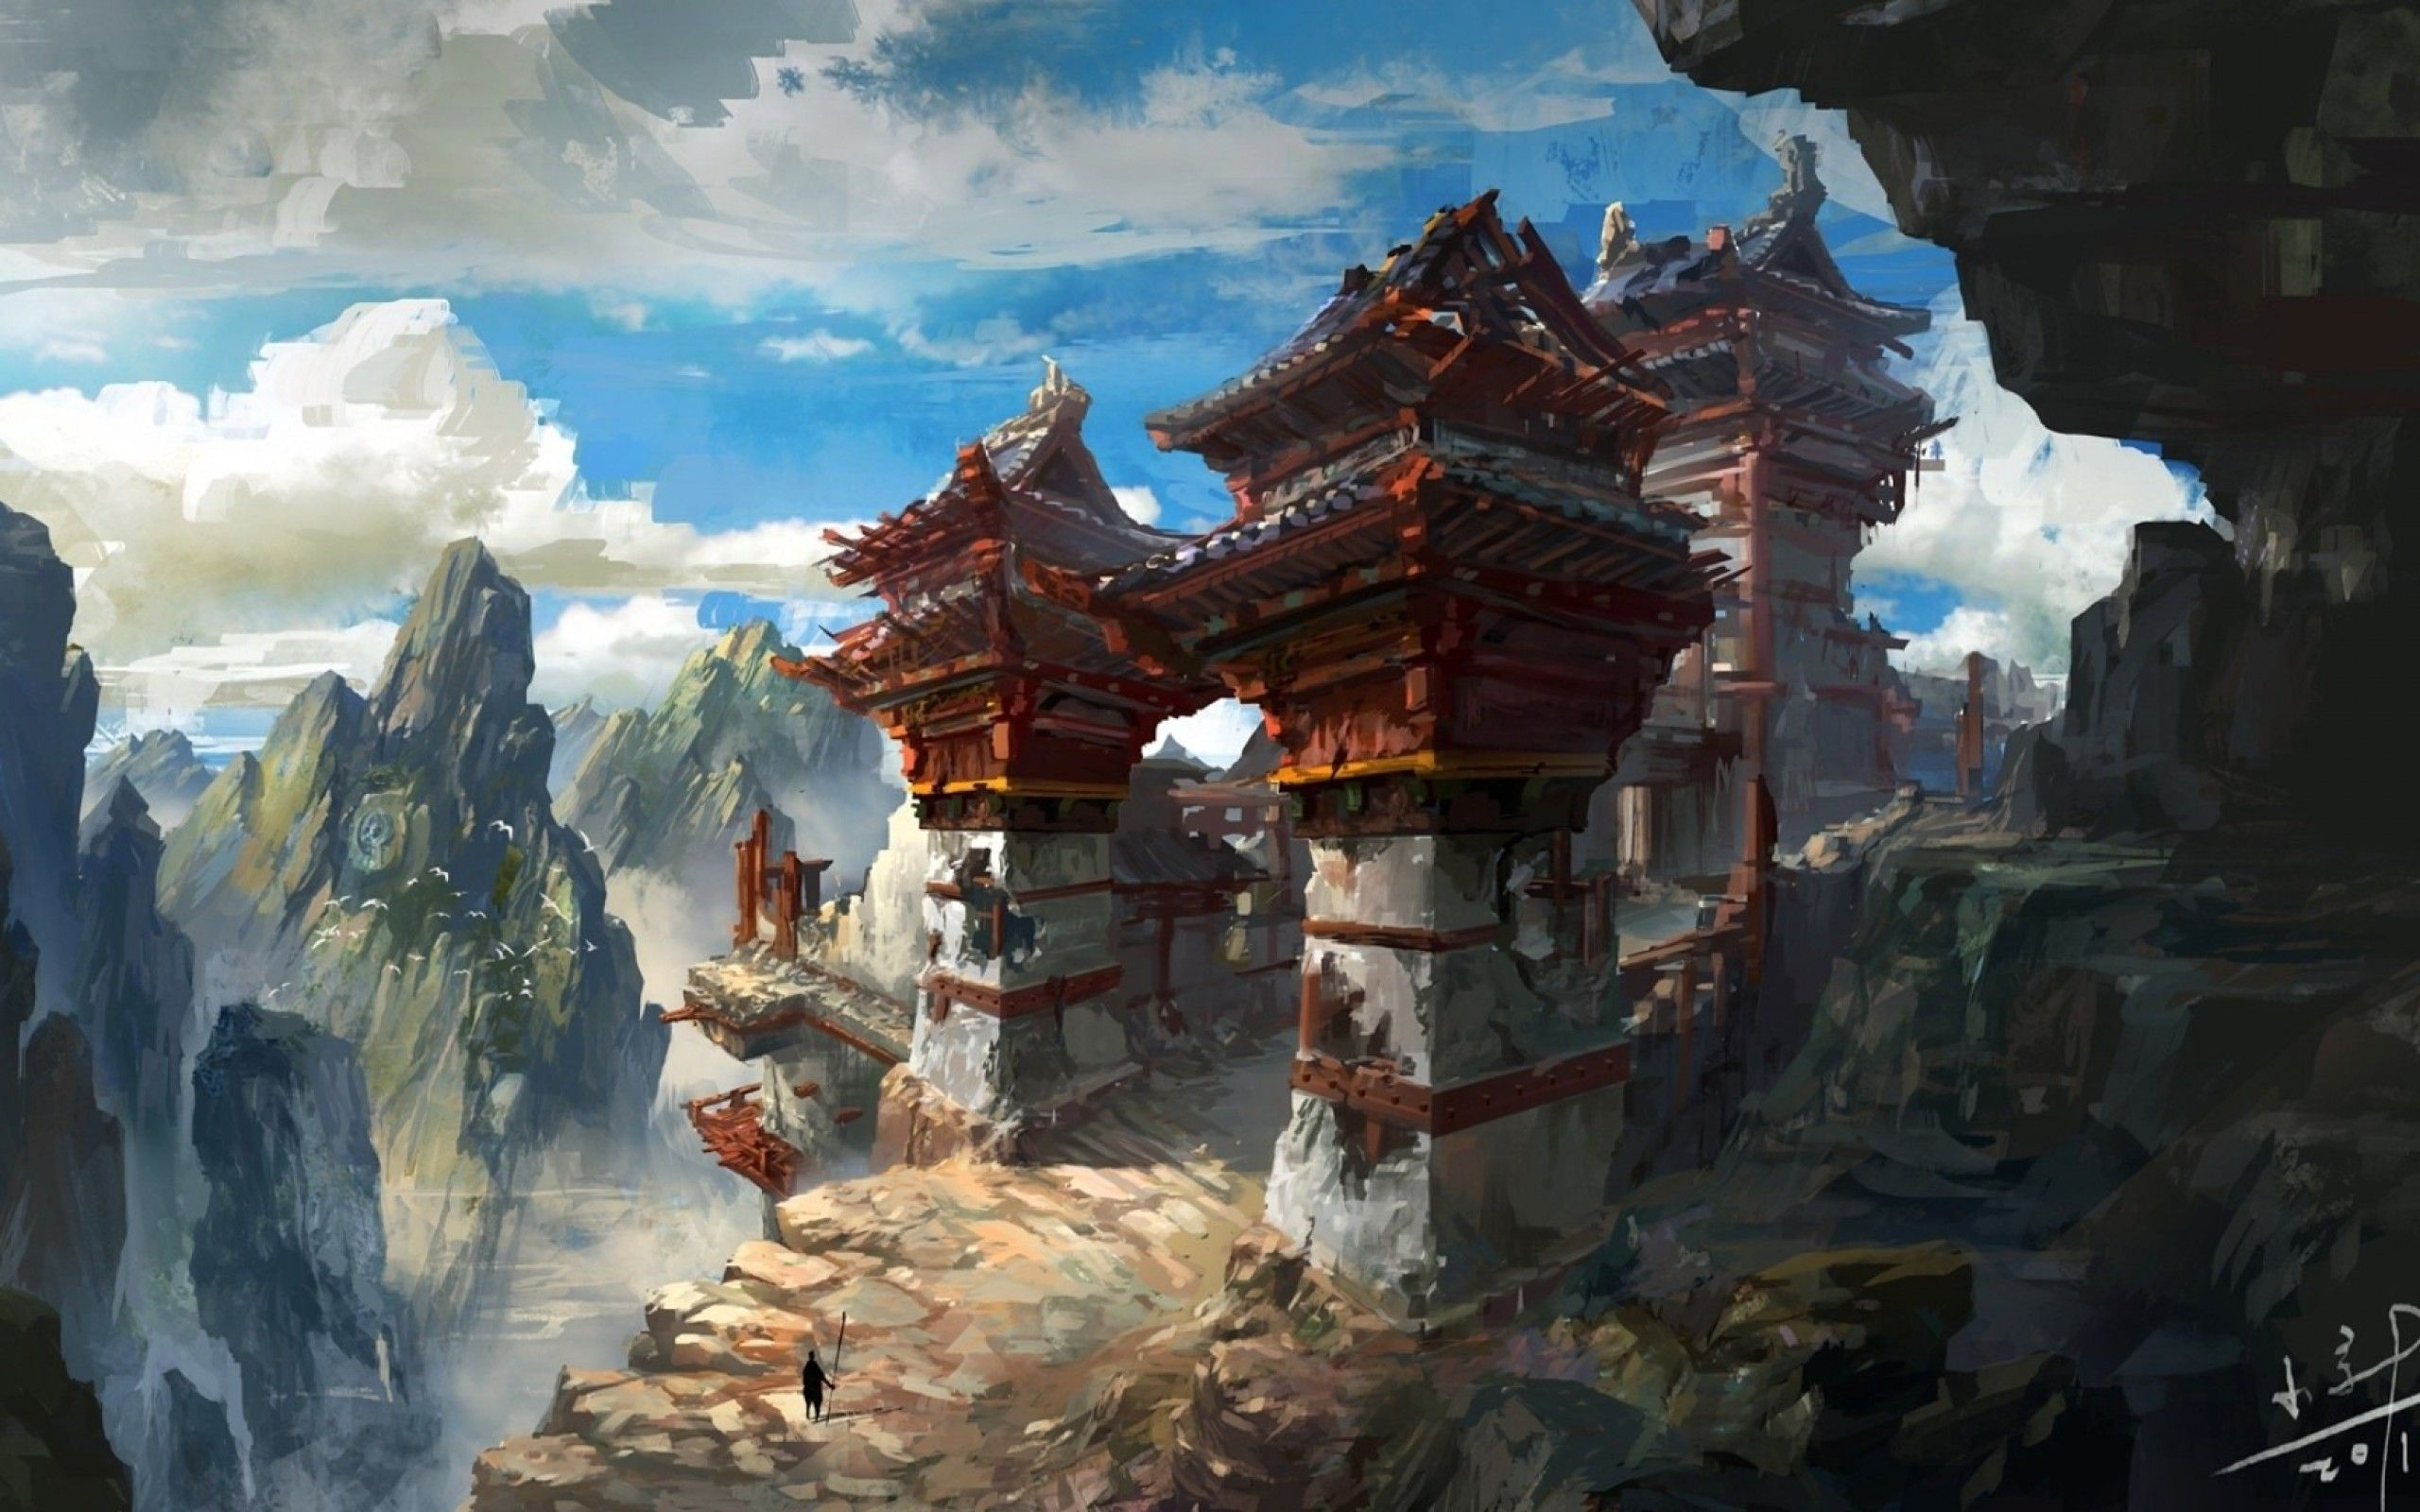 Ruined Asian mountain outpost, Illustration | Fantasy art landscapes,  Fantasy landscape, Environment concept art